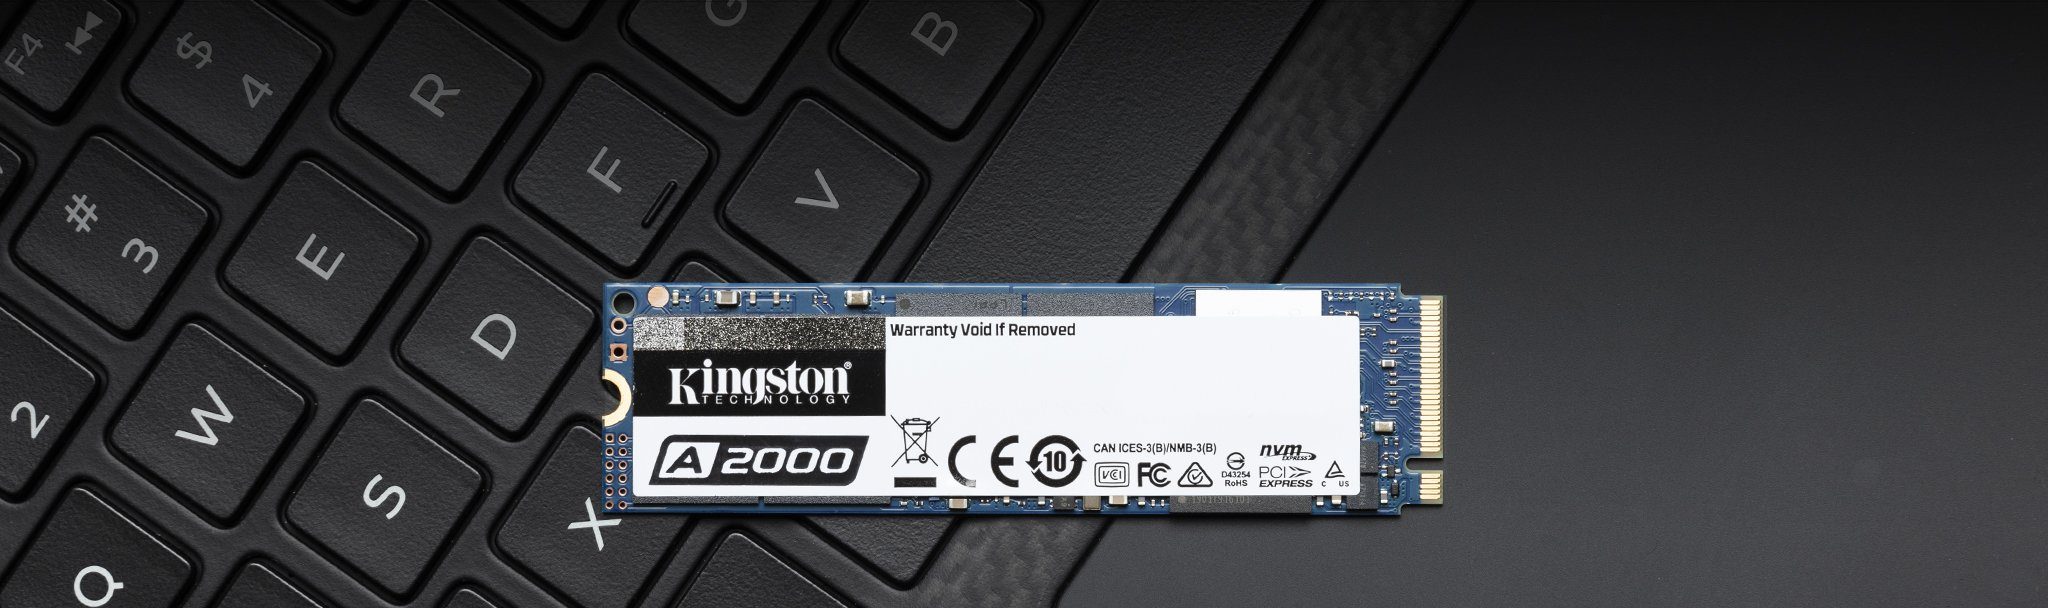 SSD NVme Kingston A2000, Performa Tinggi Harga Terjangkau.